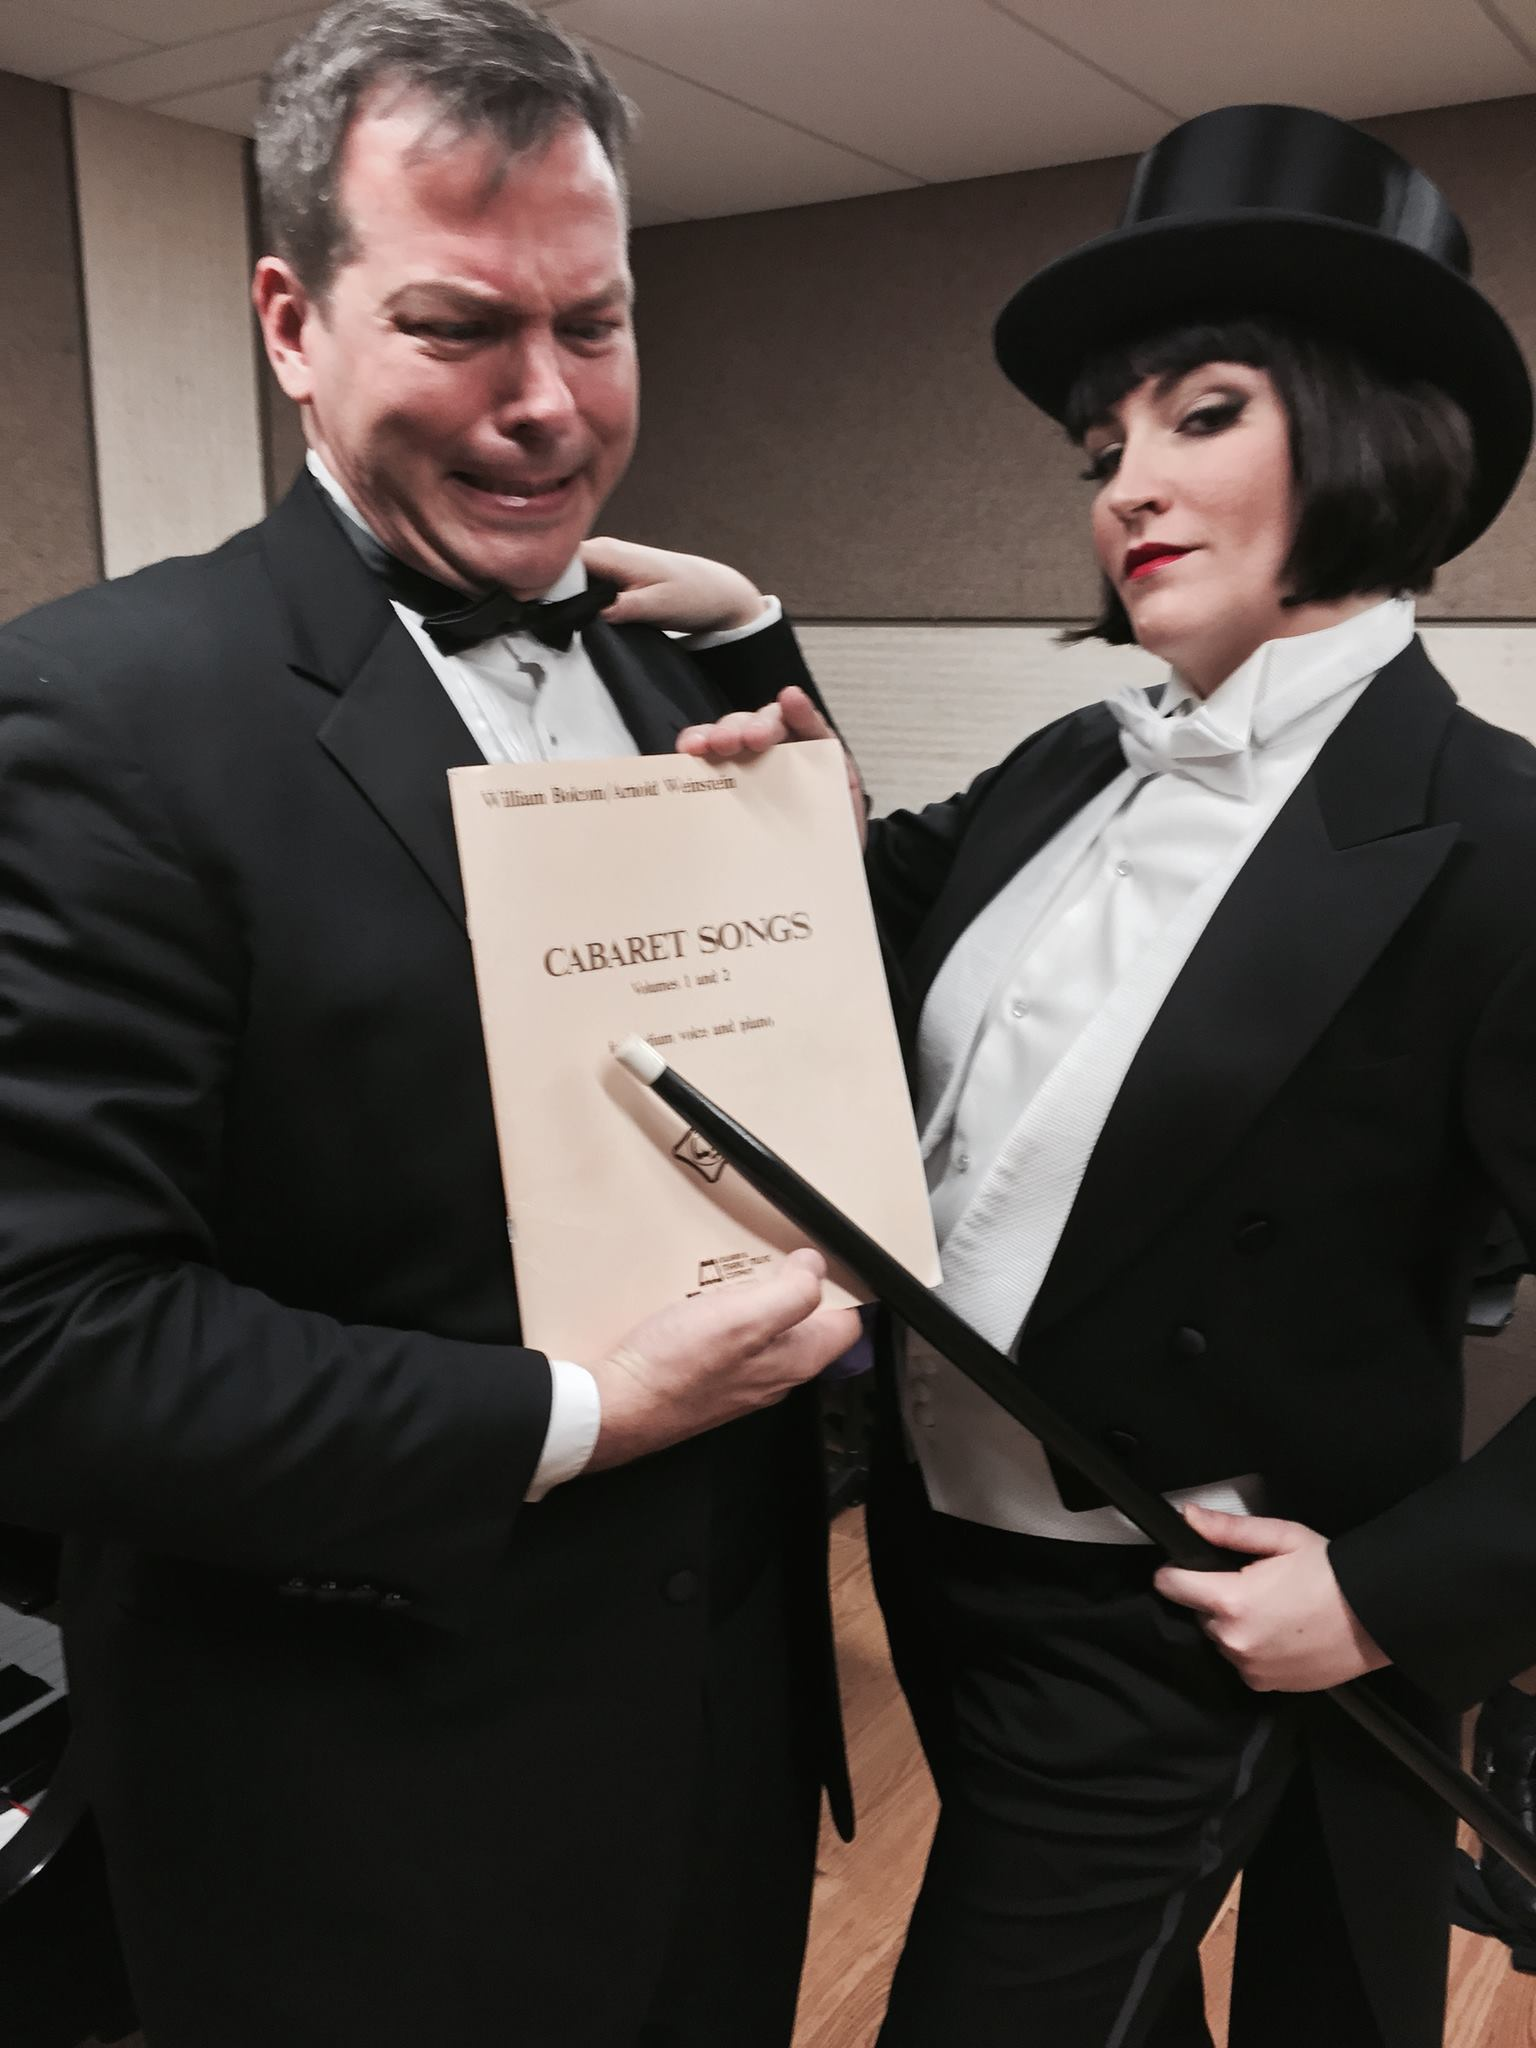 Ed Bak & Arelle Cabaret